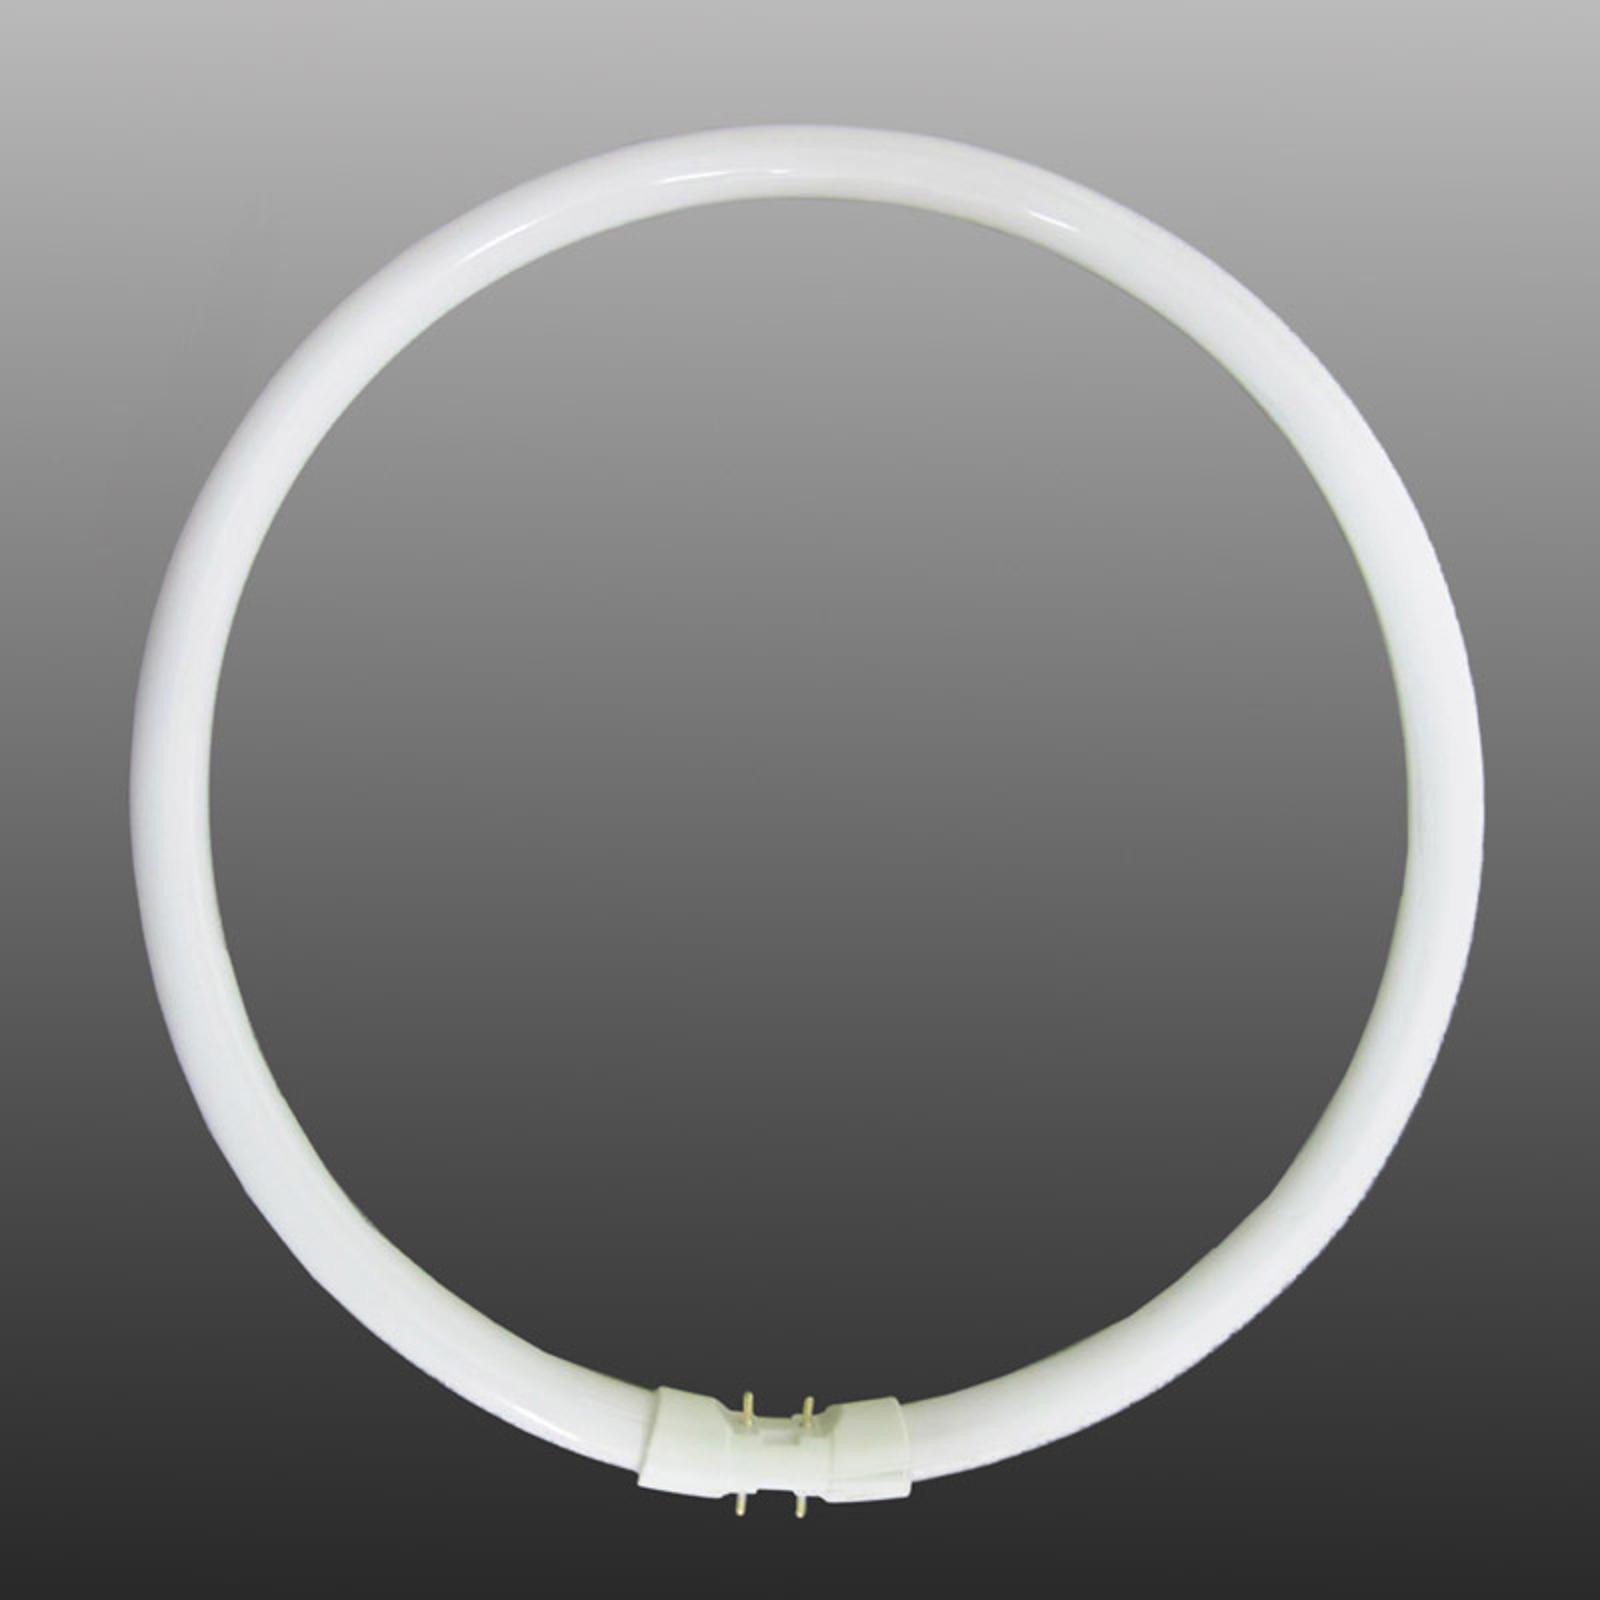 2GX13 T5 22W Ring-Leuchtstofflampe, warmweiß